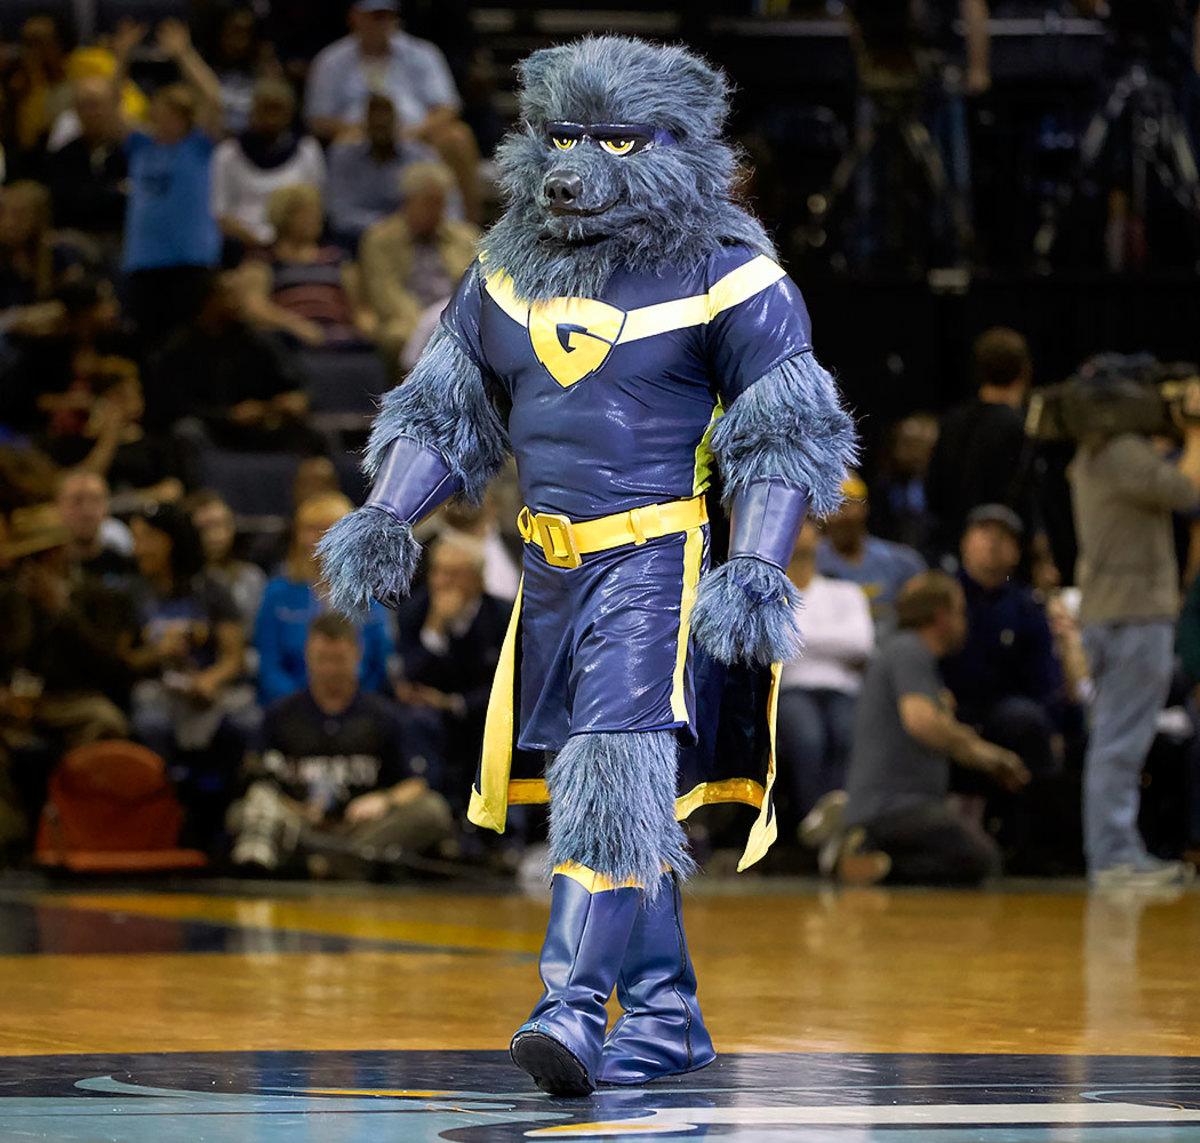 Memphis-Grizzlies-mascot-Grizz-SI315_TK1_01807.jpg